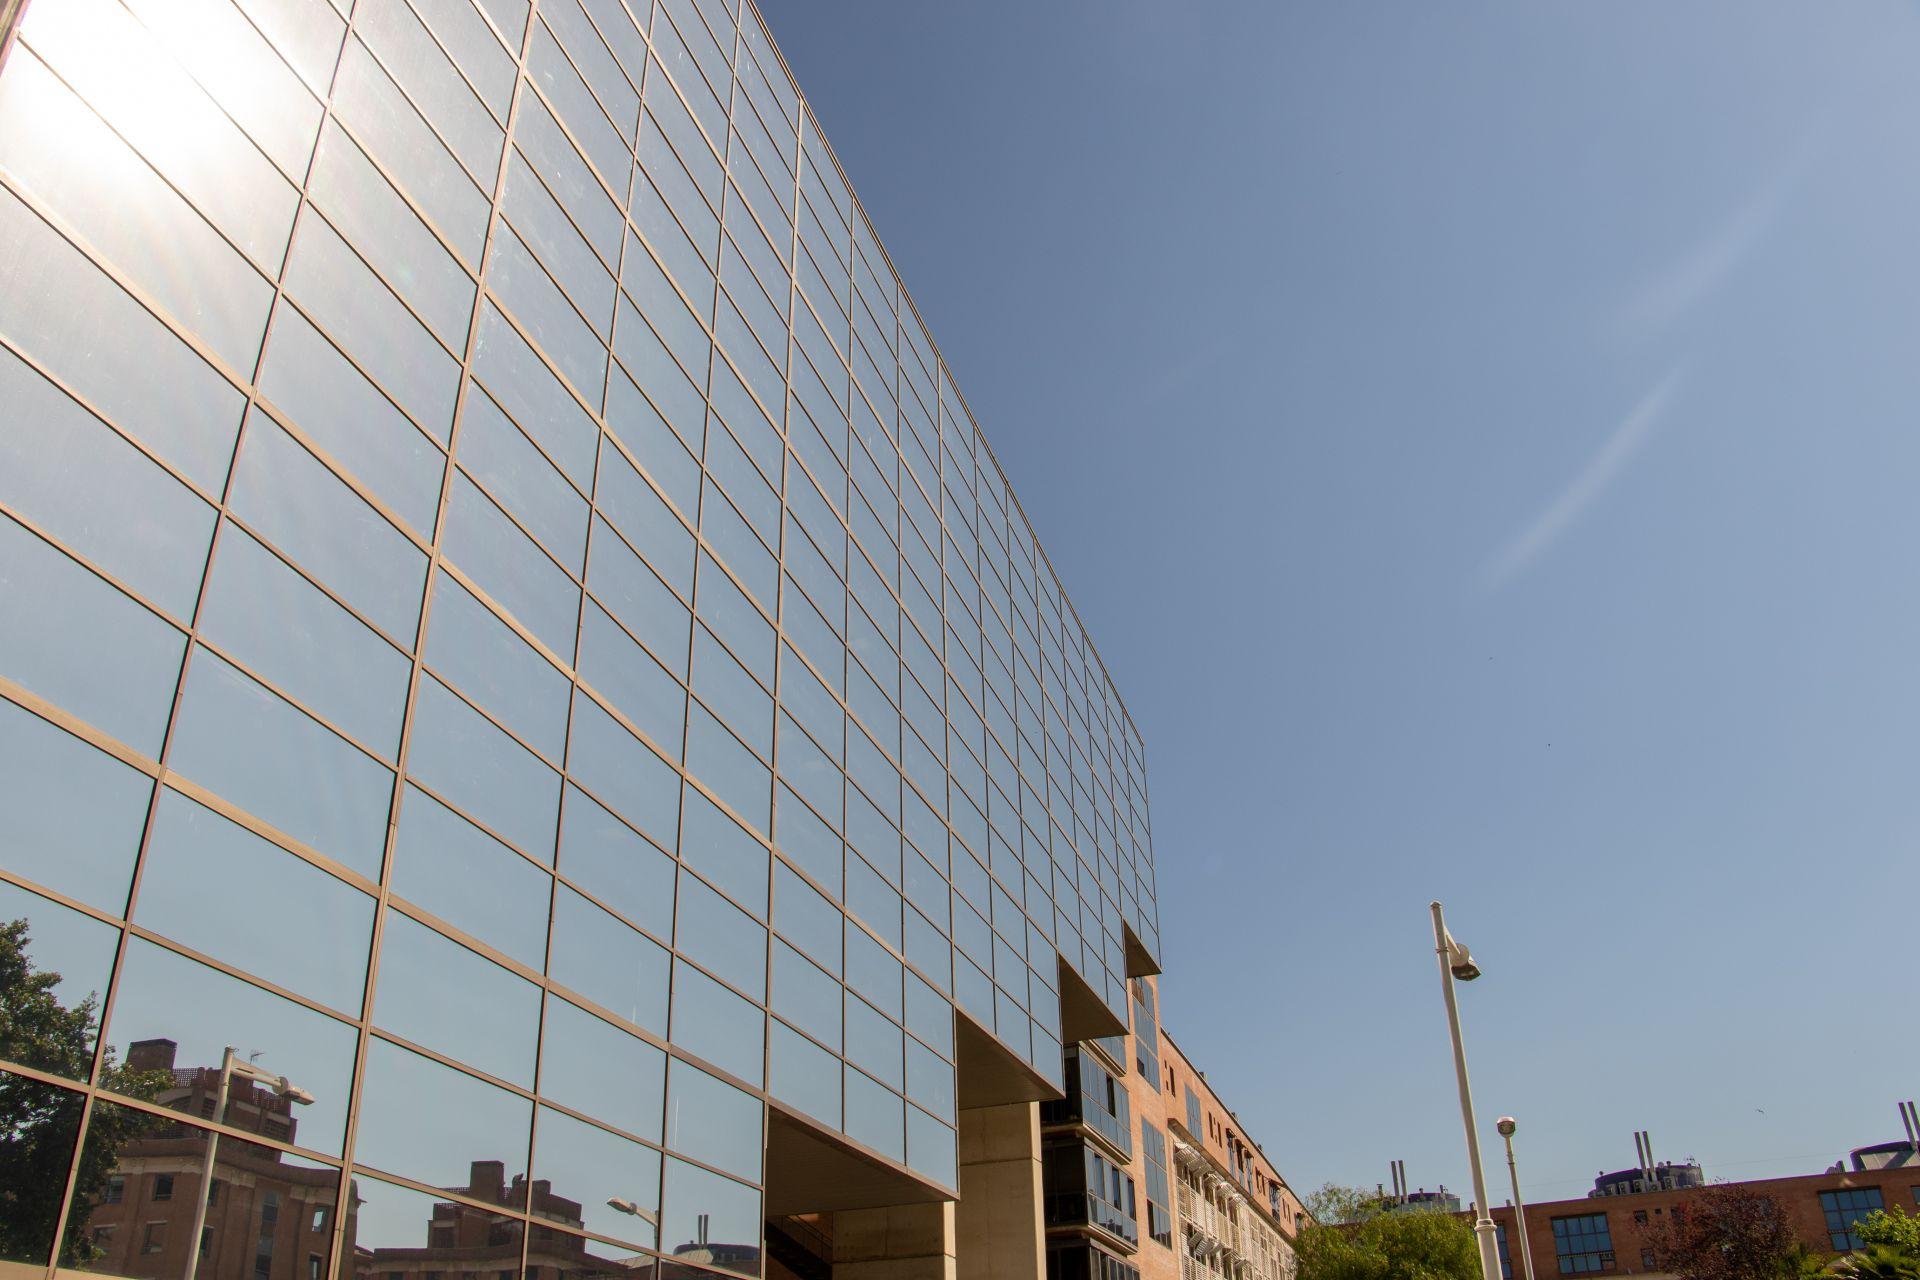 UniversityBarcelona Harbour Book Read Reviewsamp; Online space qGSpMUzV